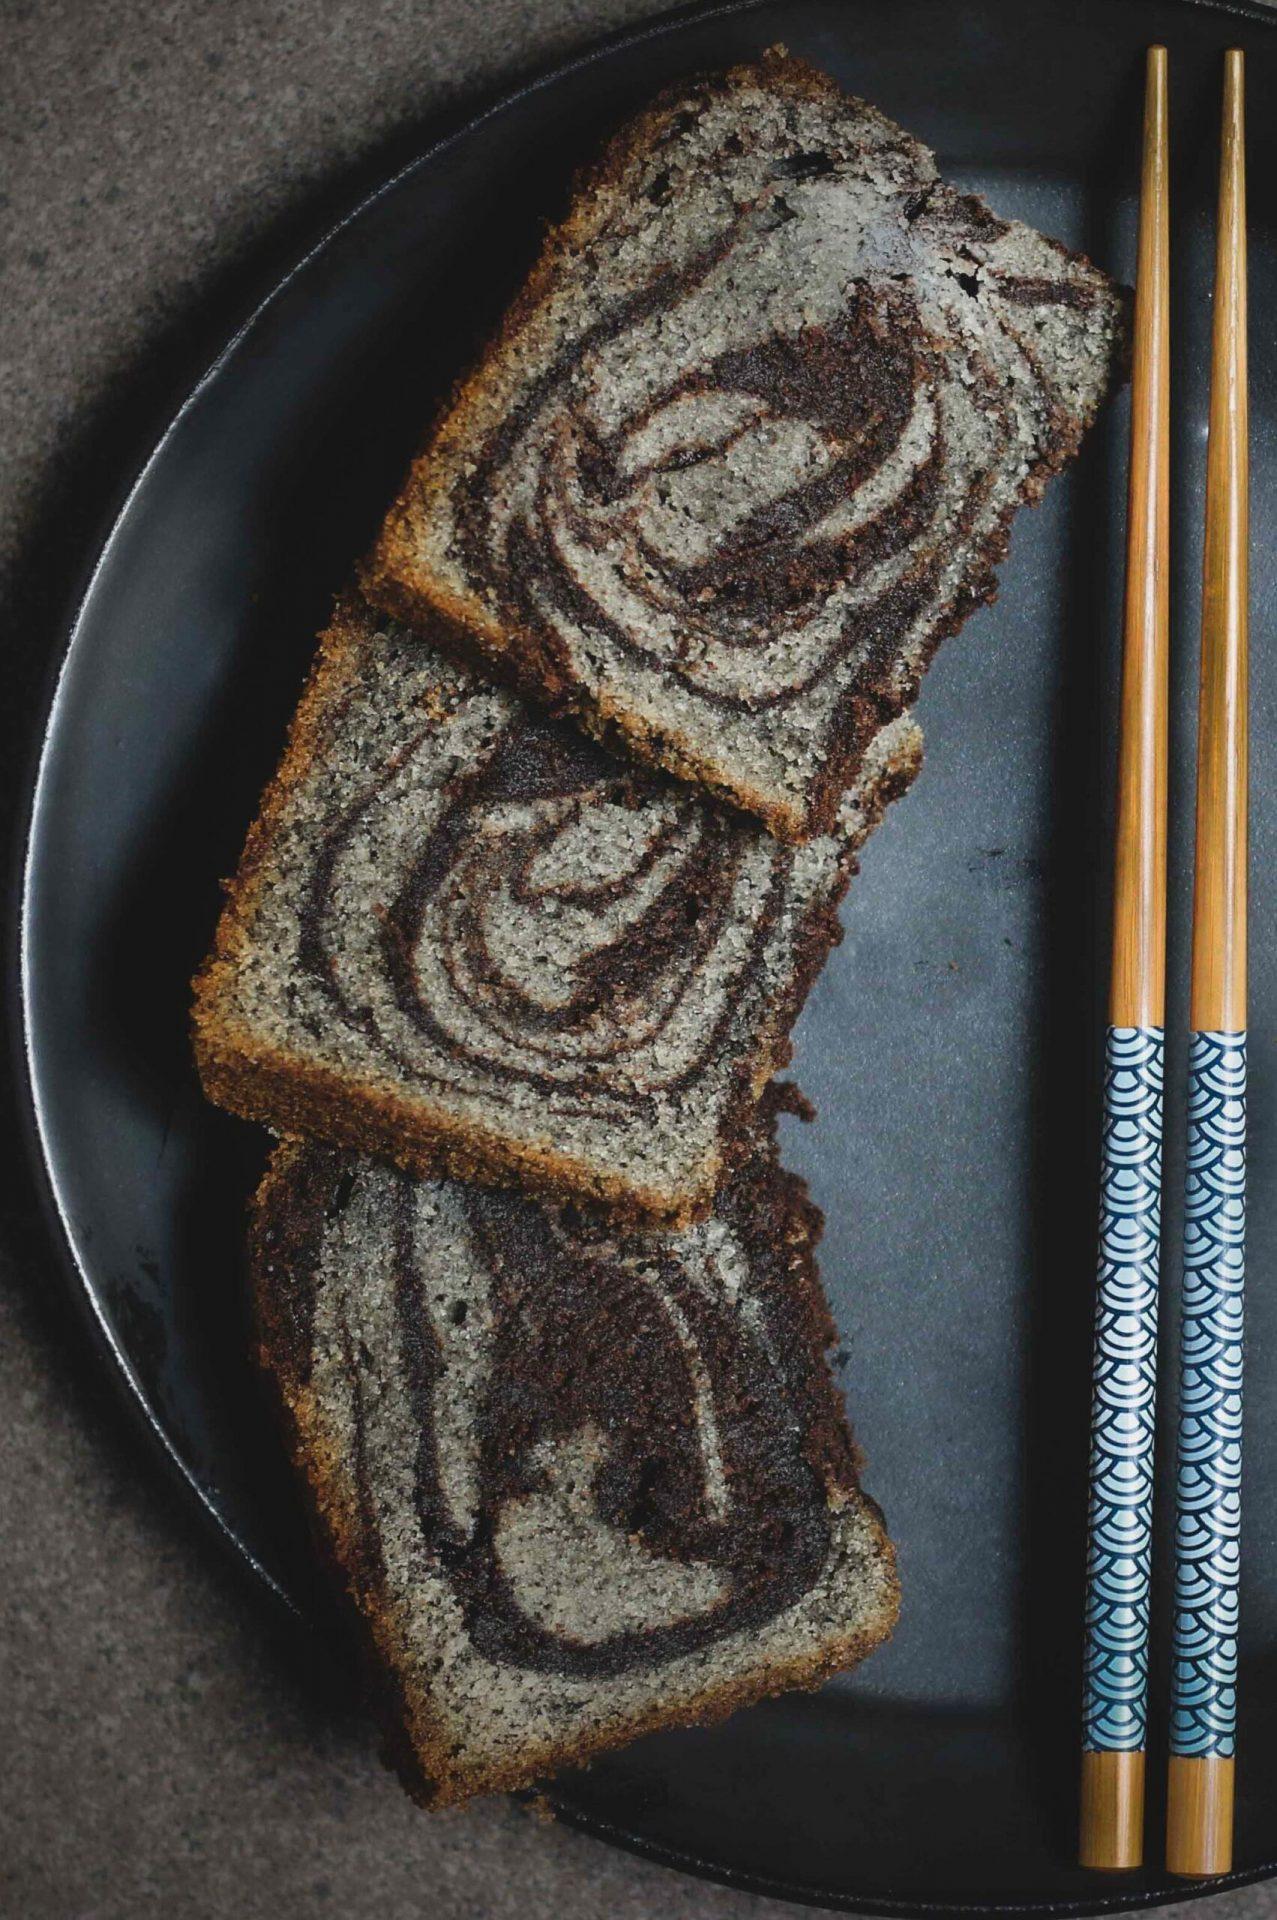 Chocolate and Black Sesame Marble Cake